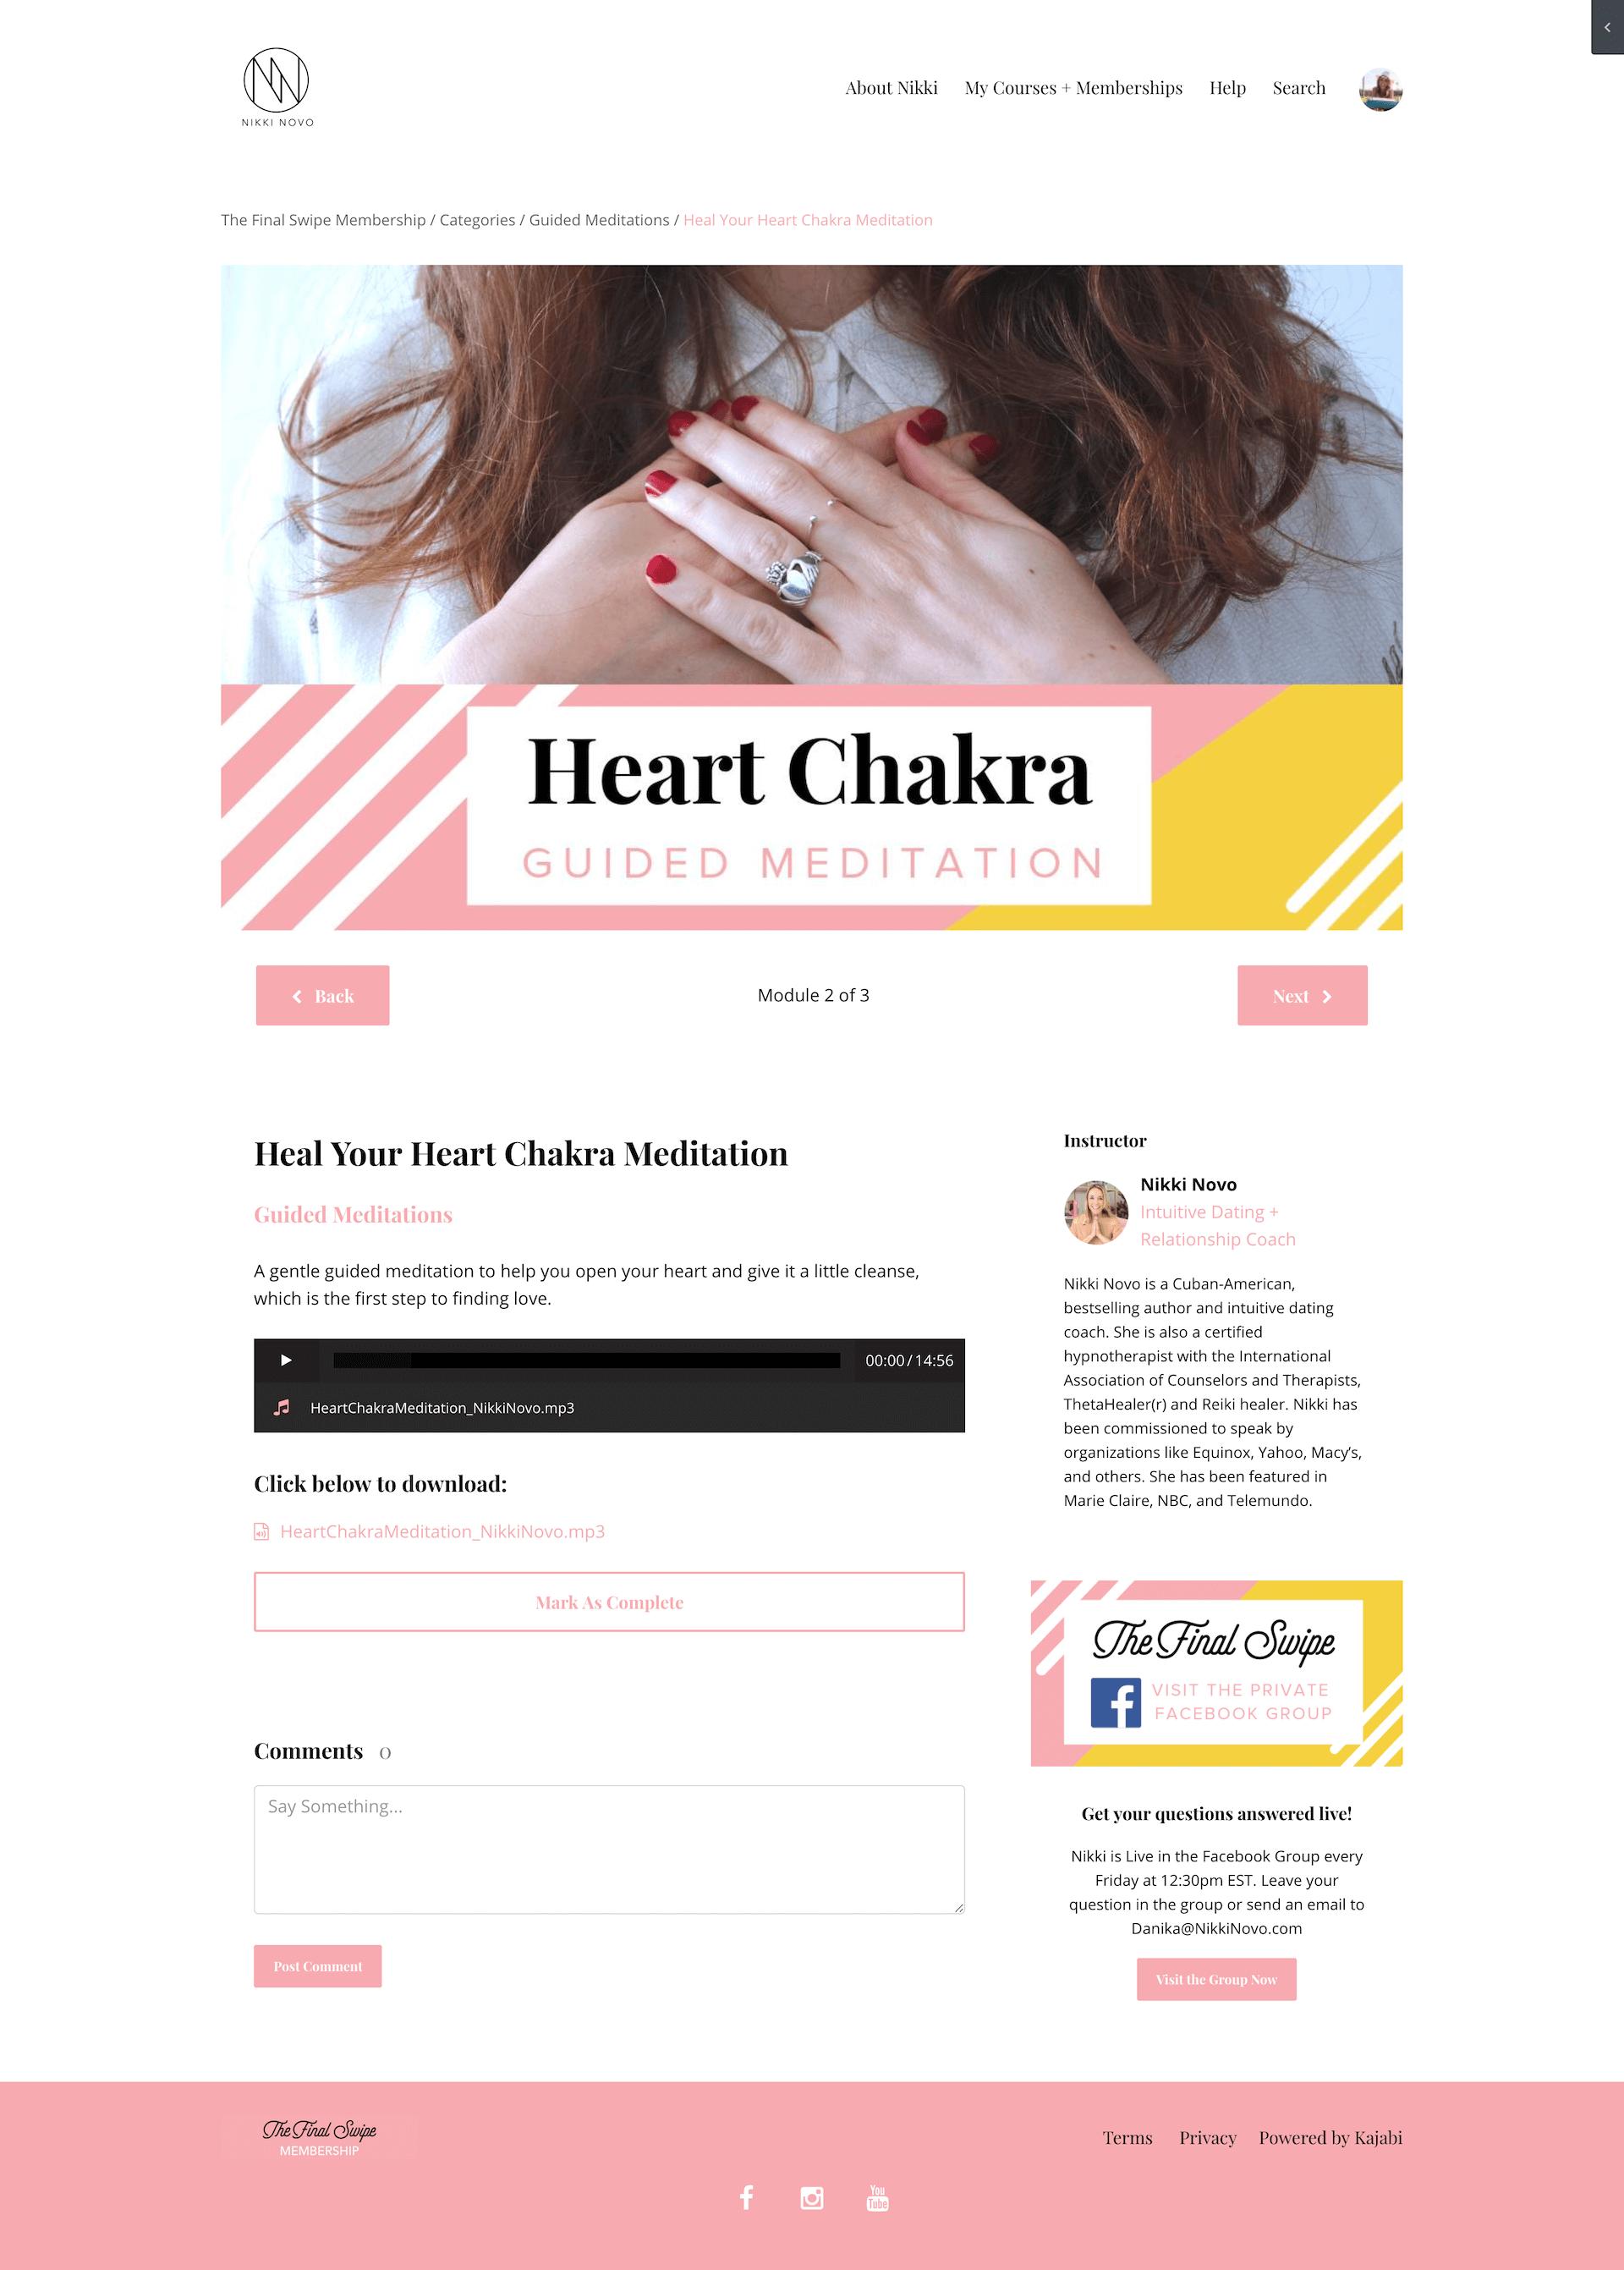 Kajabi Customization for Intuitive Dating Coach, Nikki Novo. © 2019 Awake Website Design.